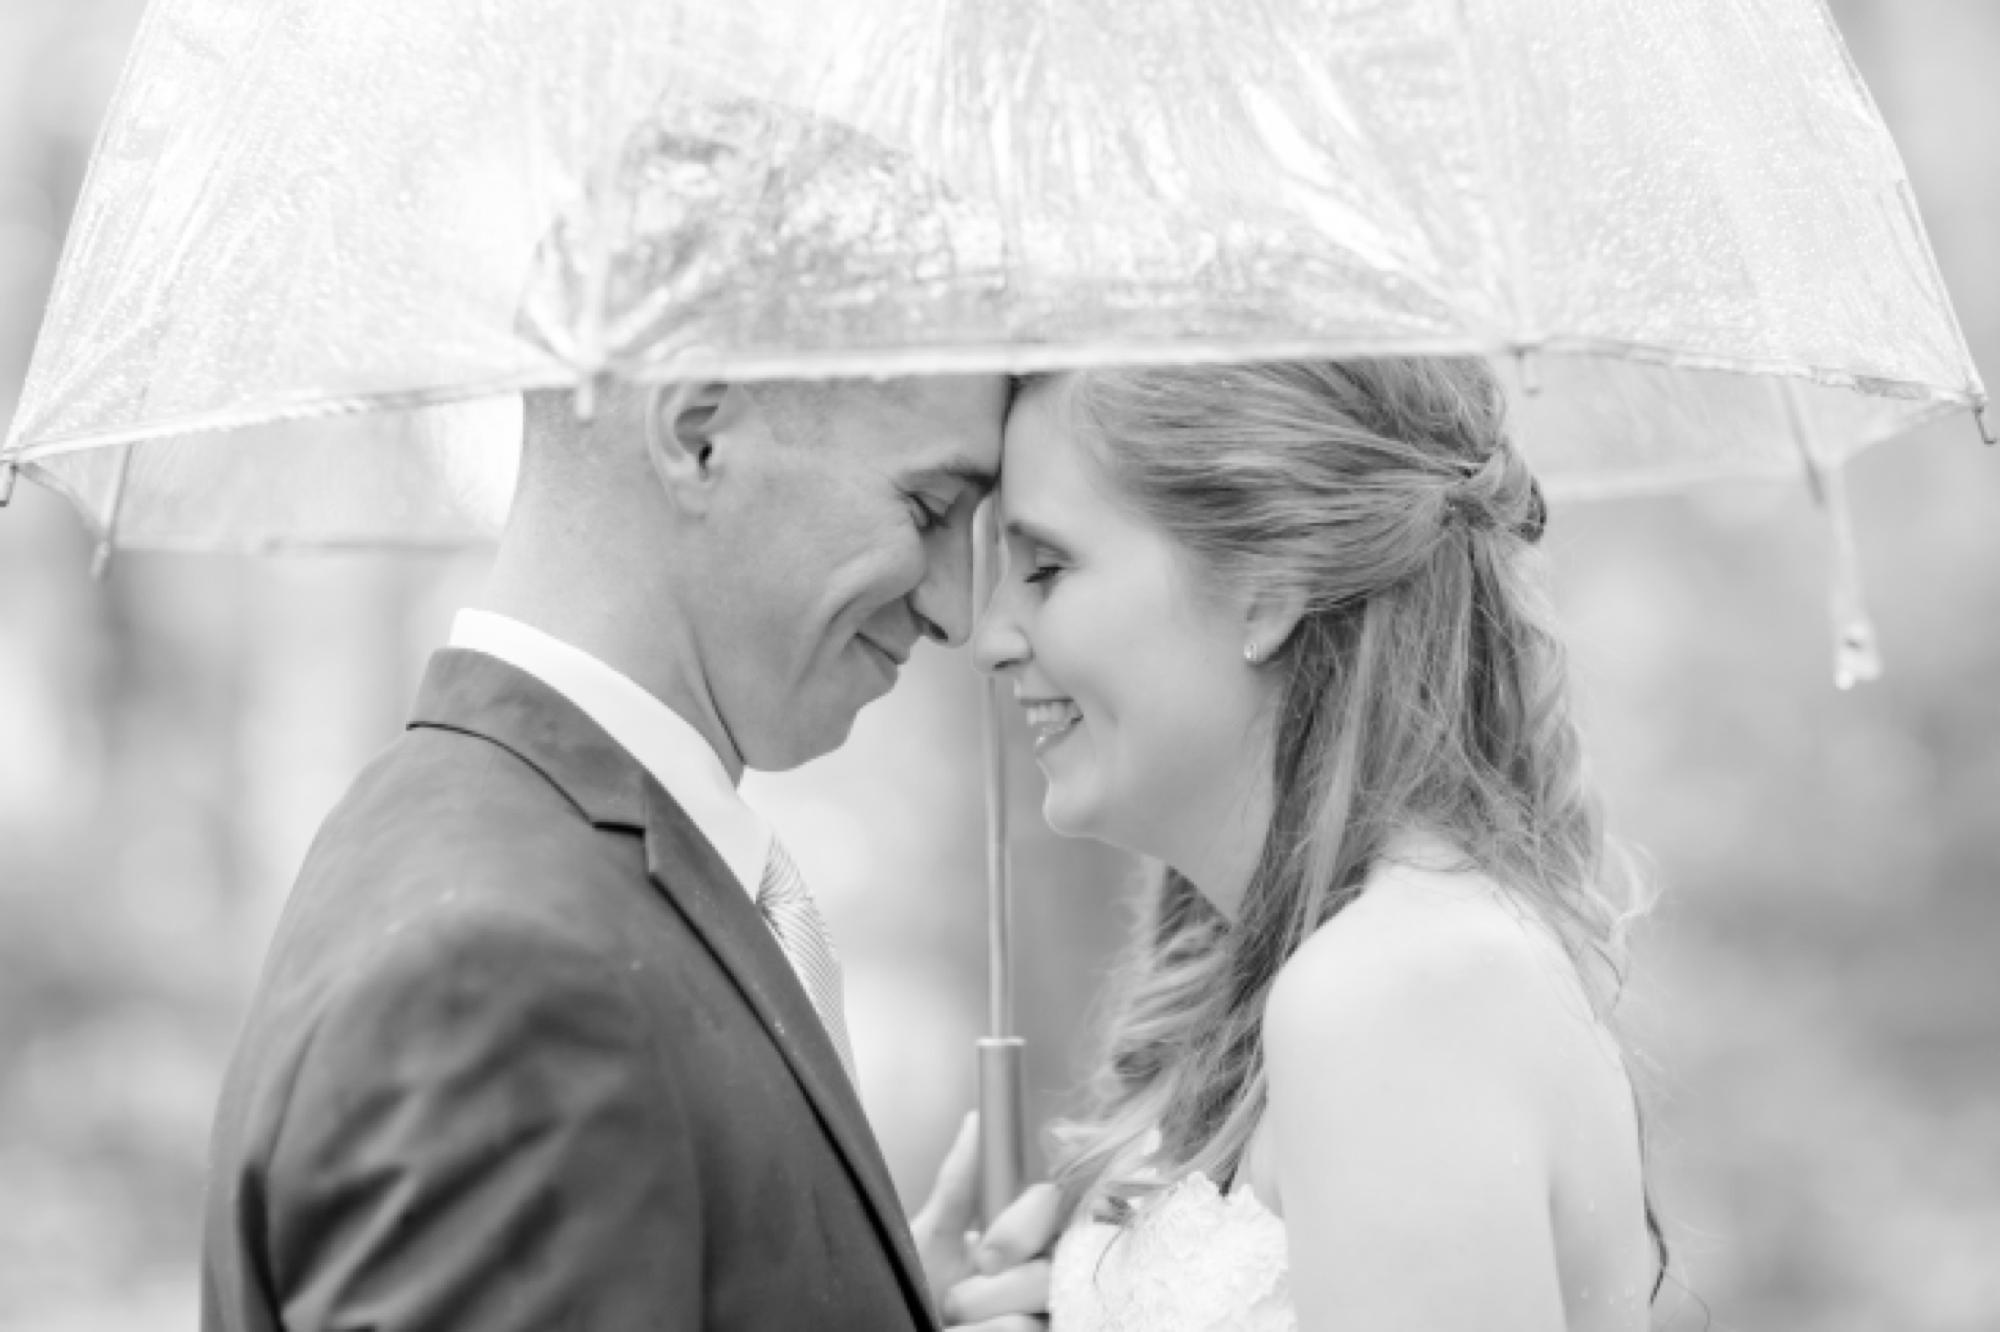 Rainy day wedding portraits can be so romantic!